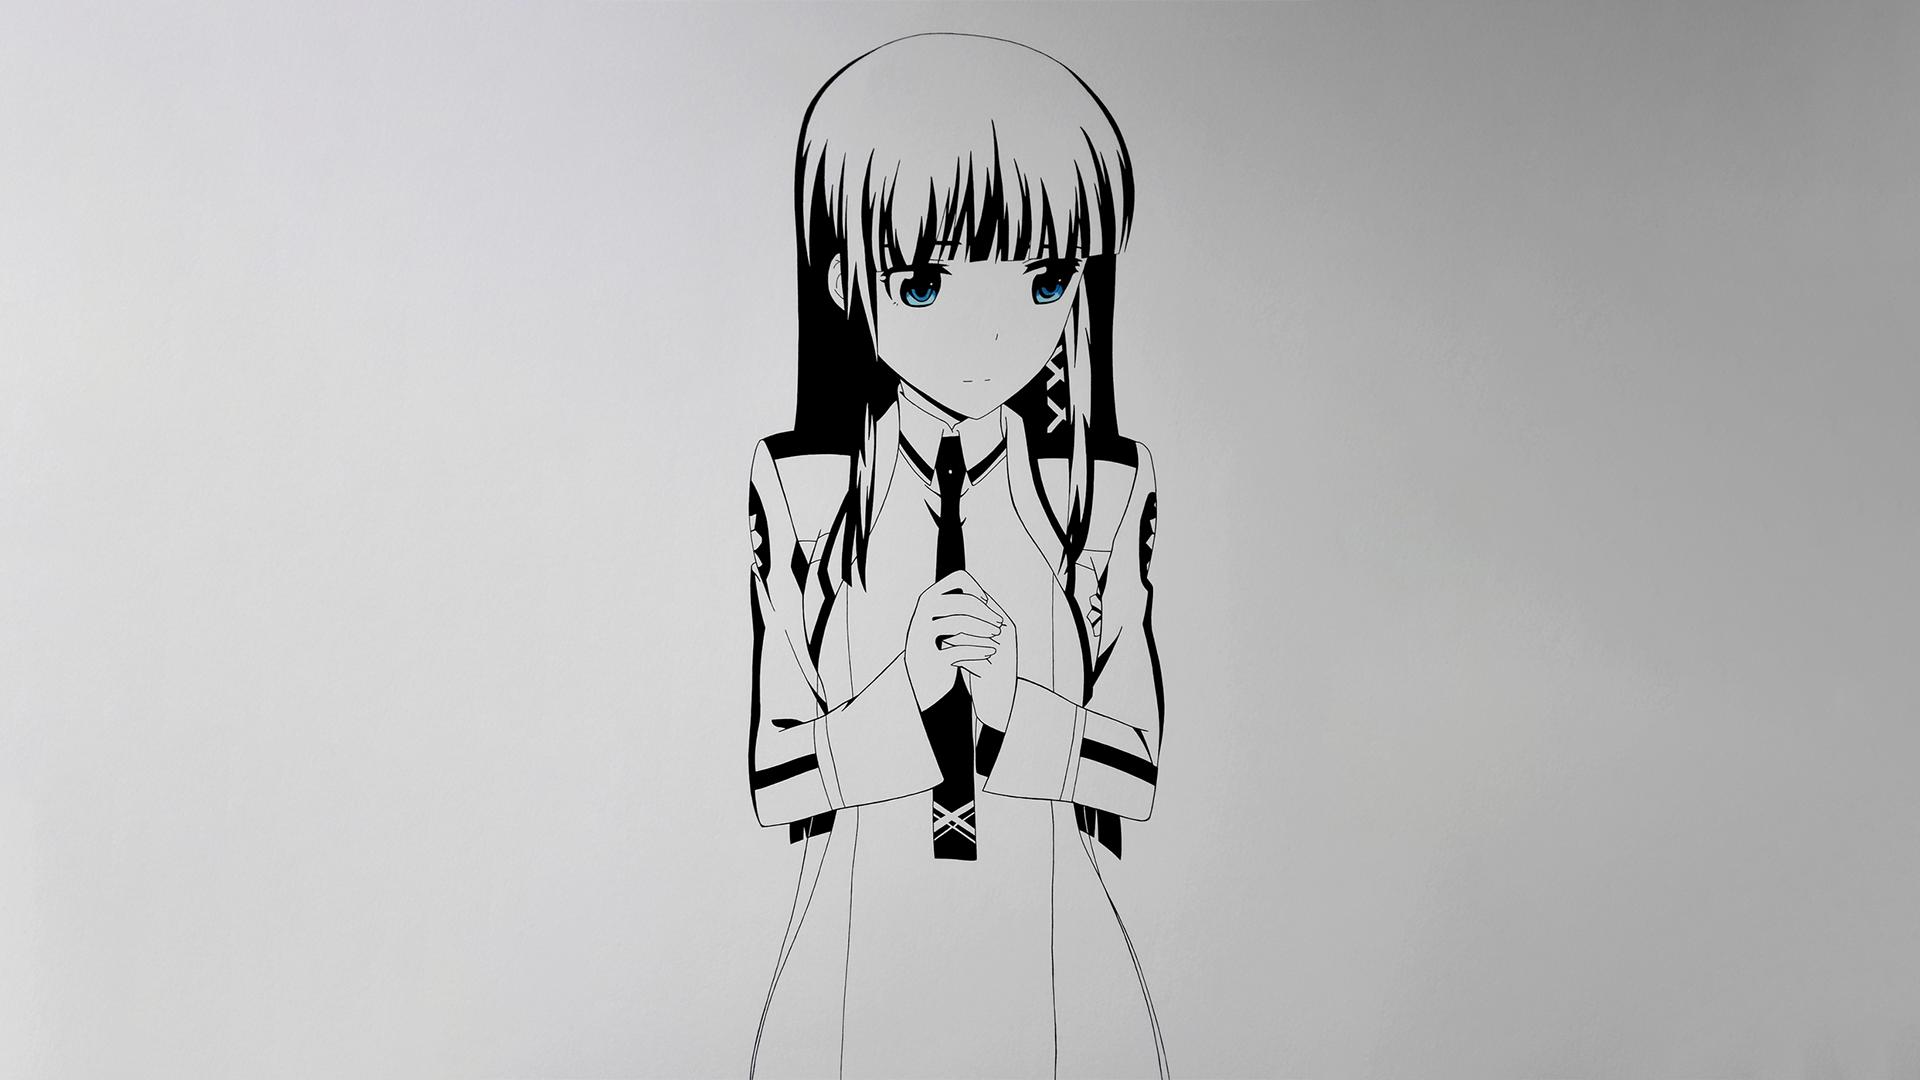 Wallpaper Ilustrasi Satu Warna Gadis Anime Gambar